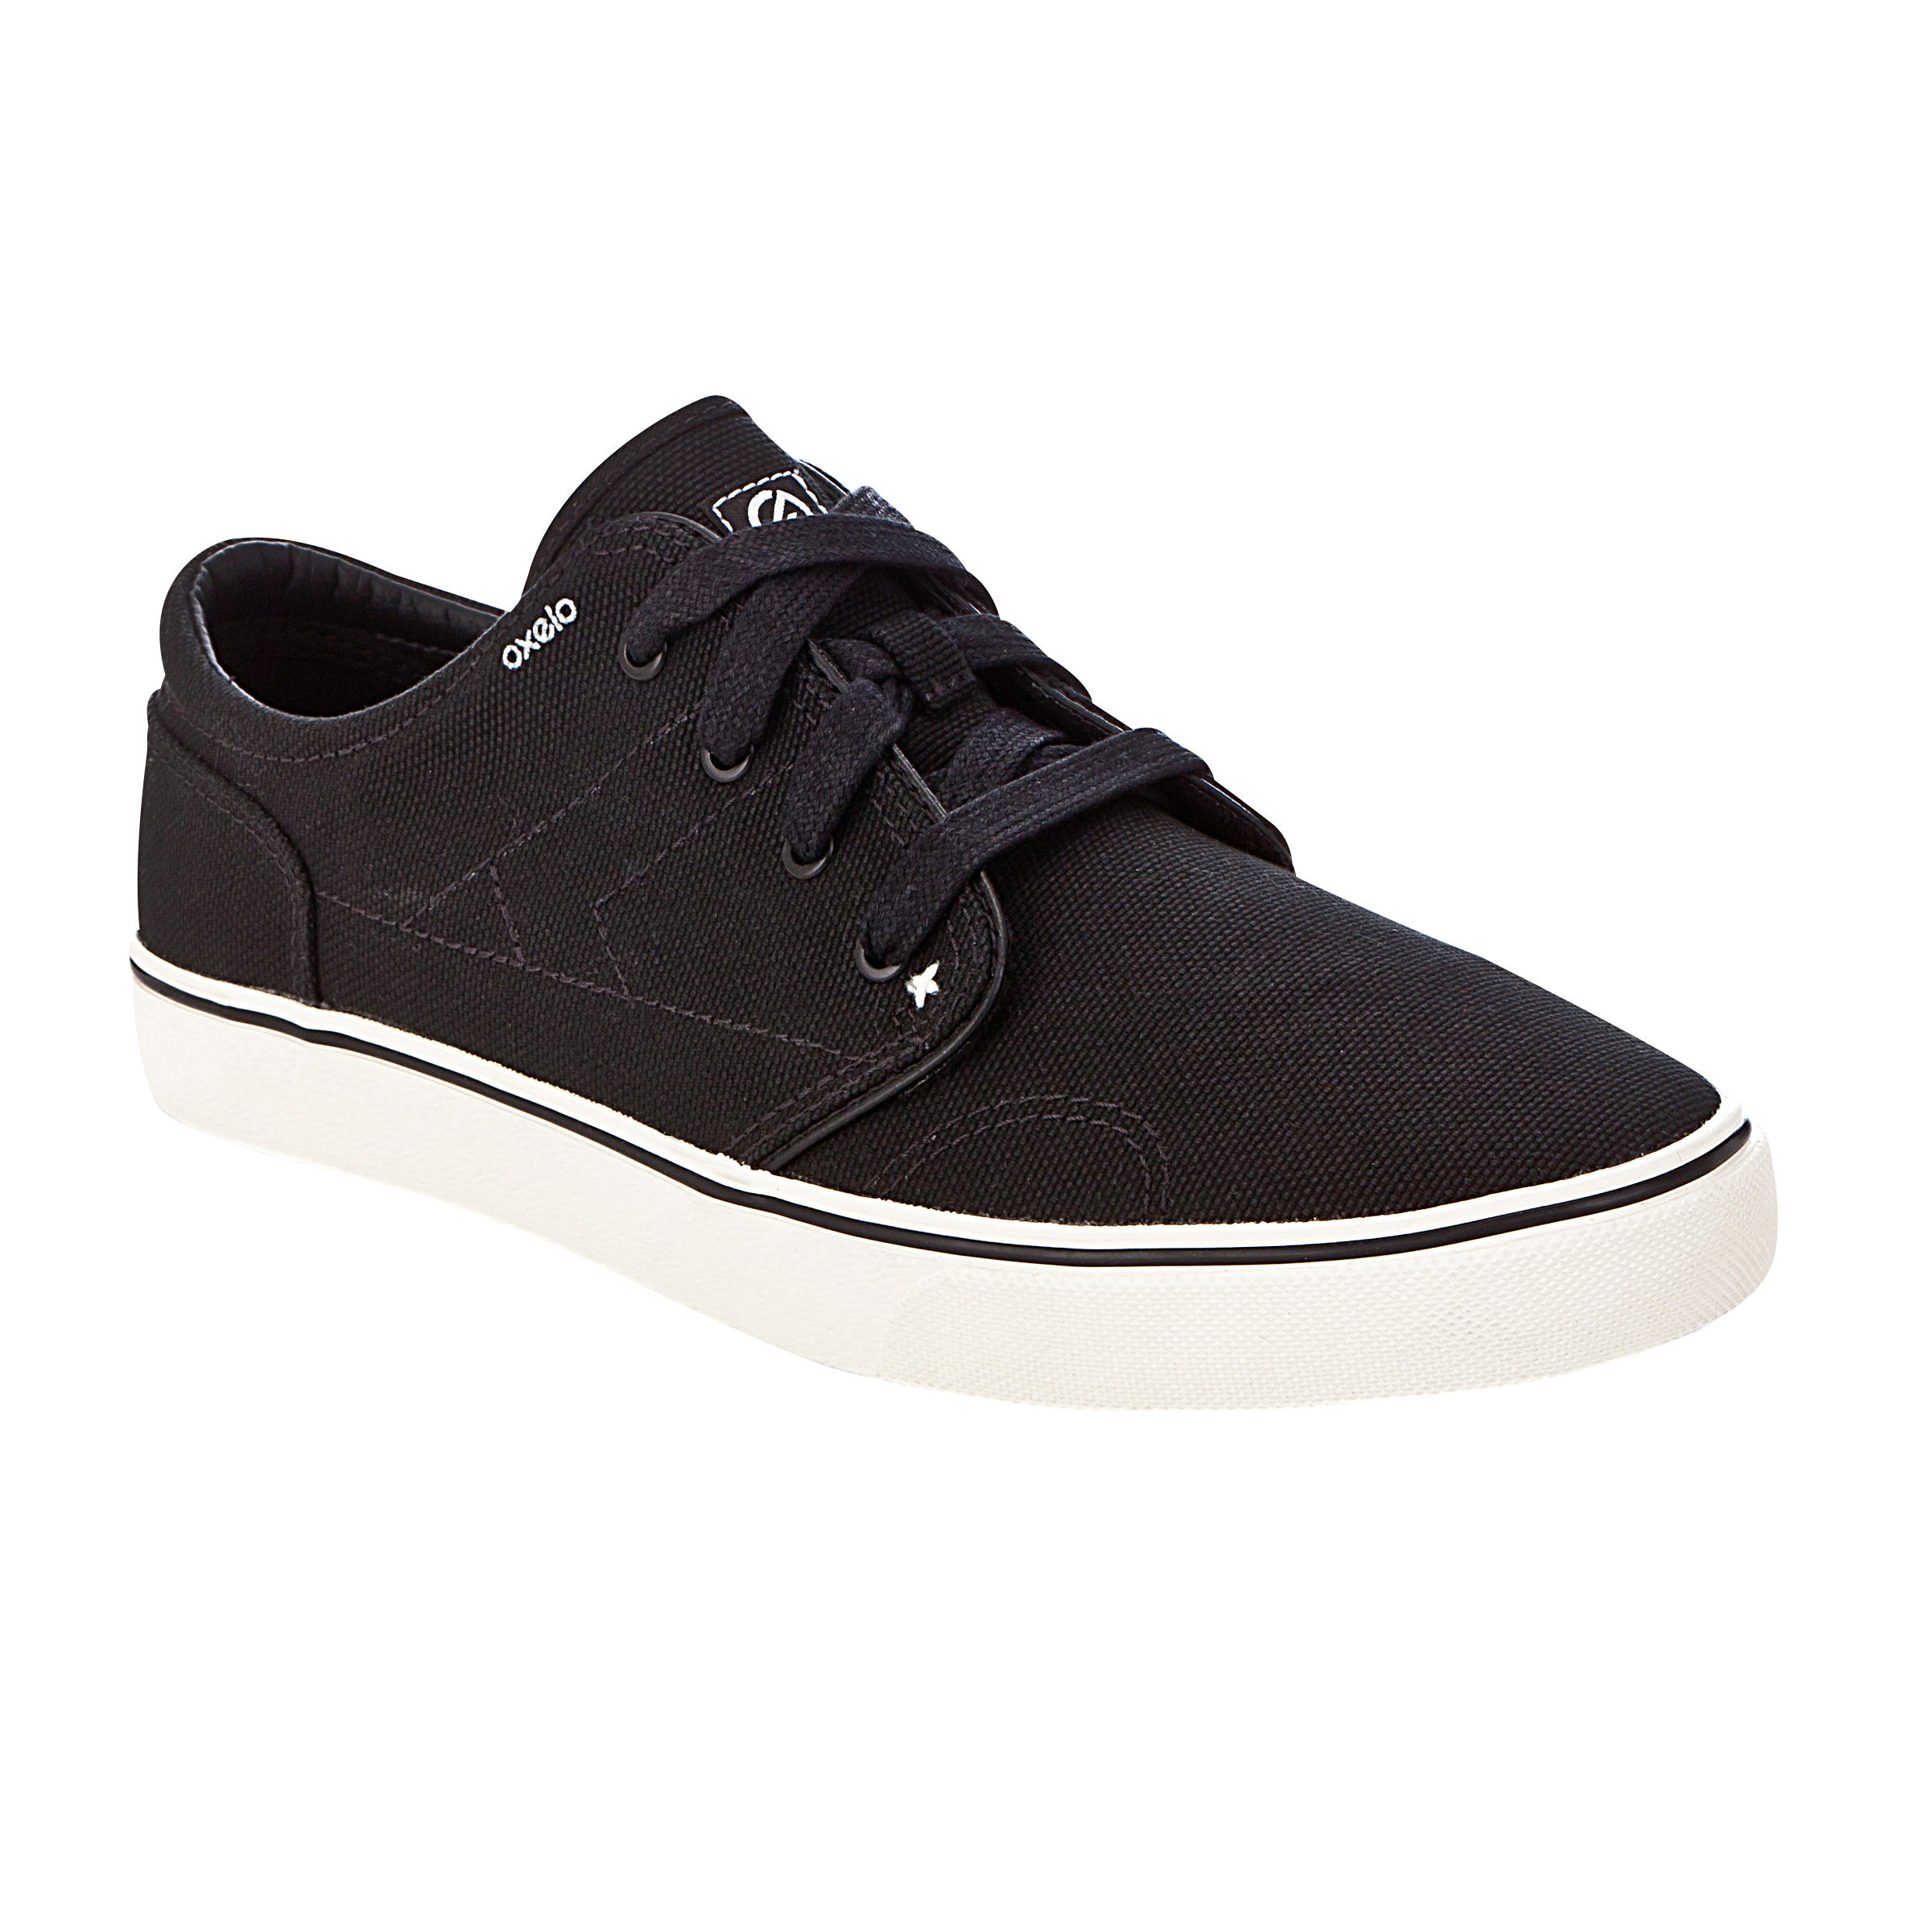 Sepatu Rendah Longboard Skateboard Vulca Canvas L Dewasa - Hitam